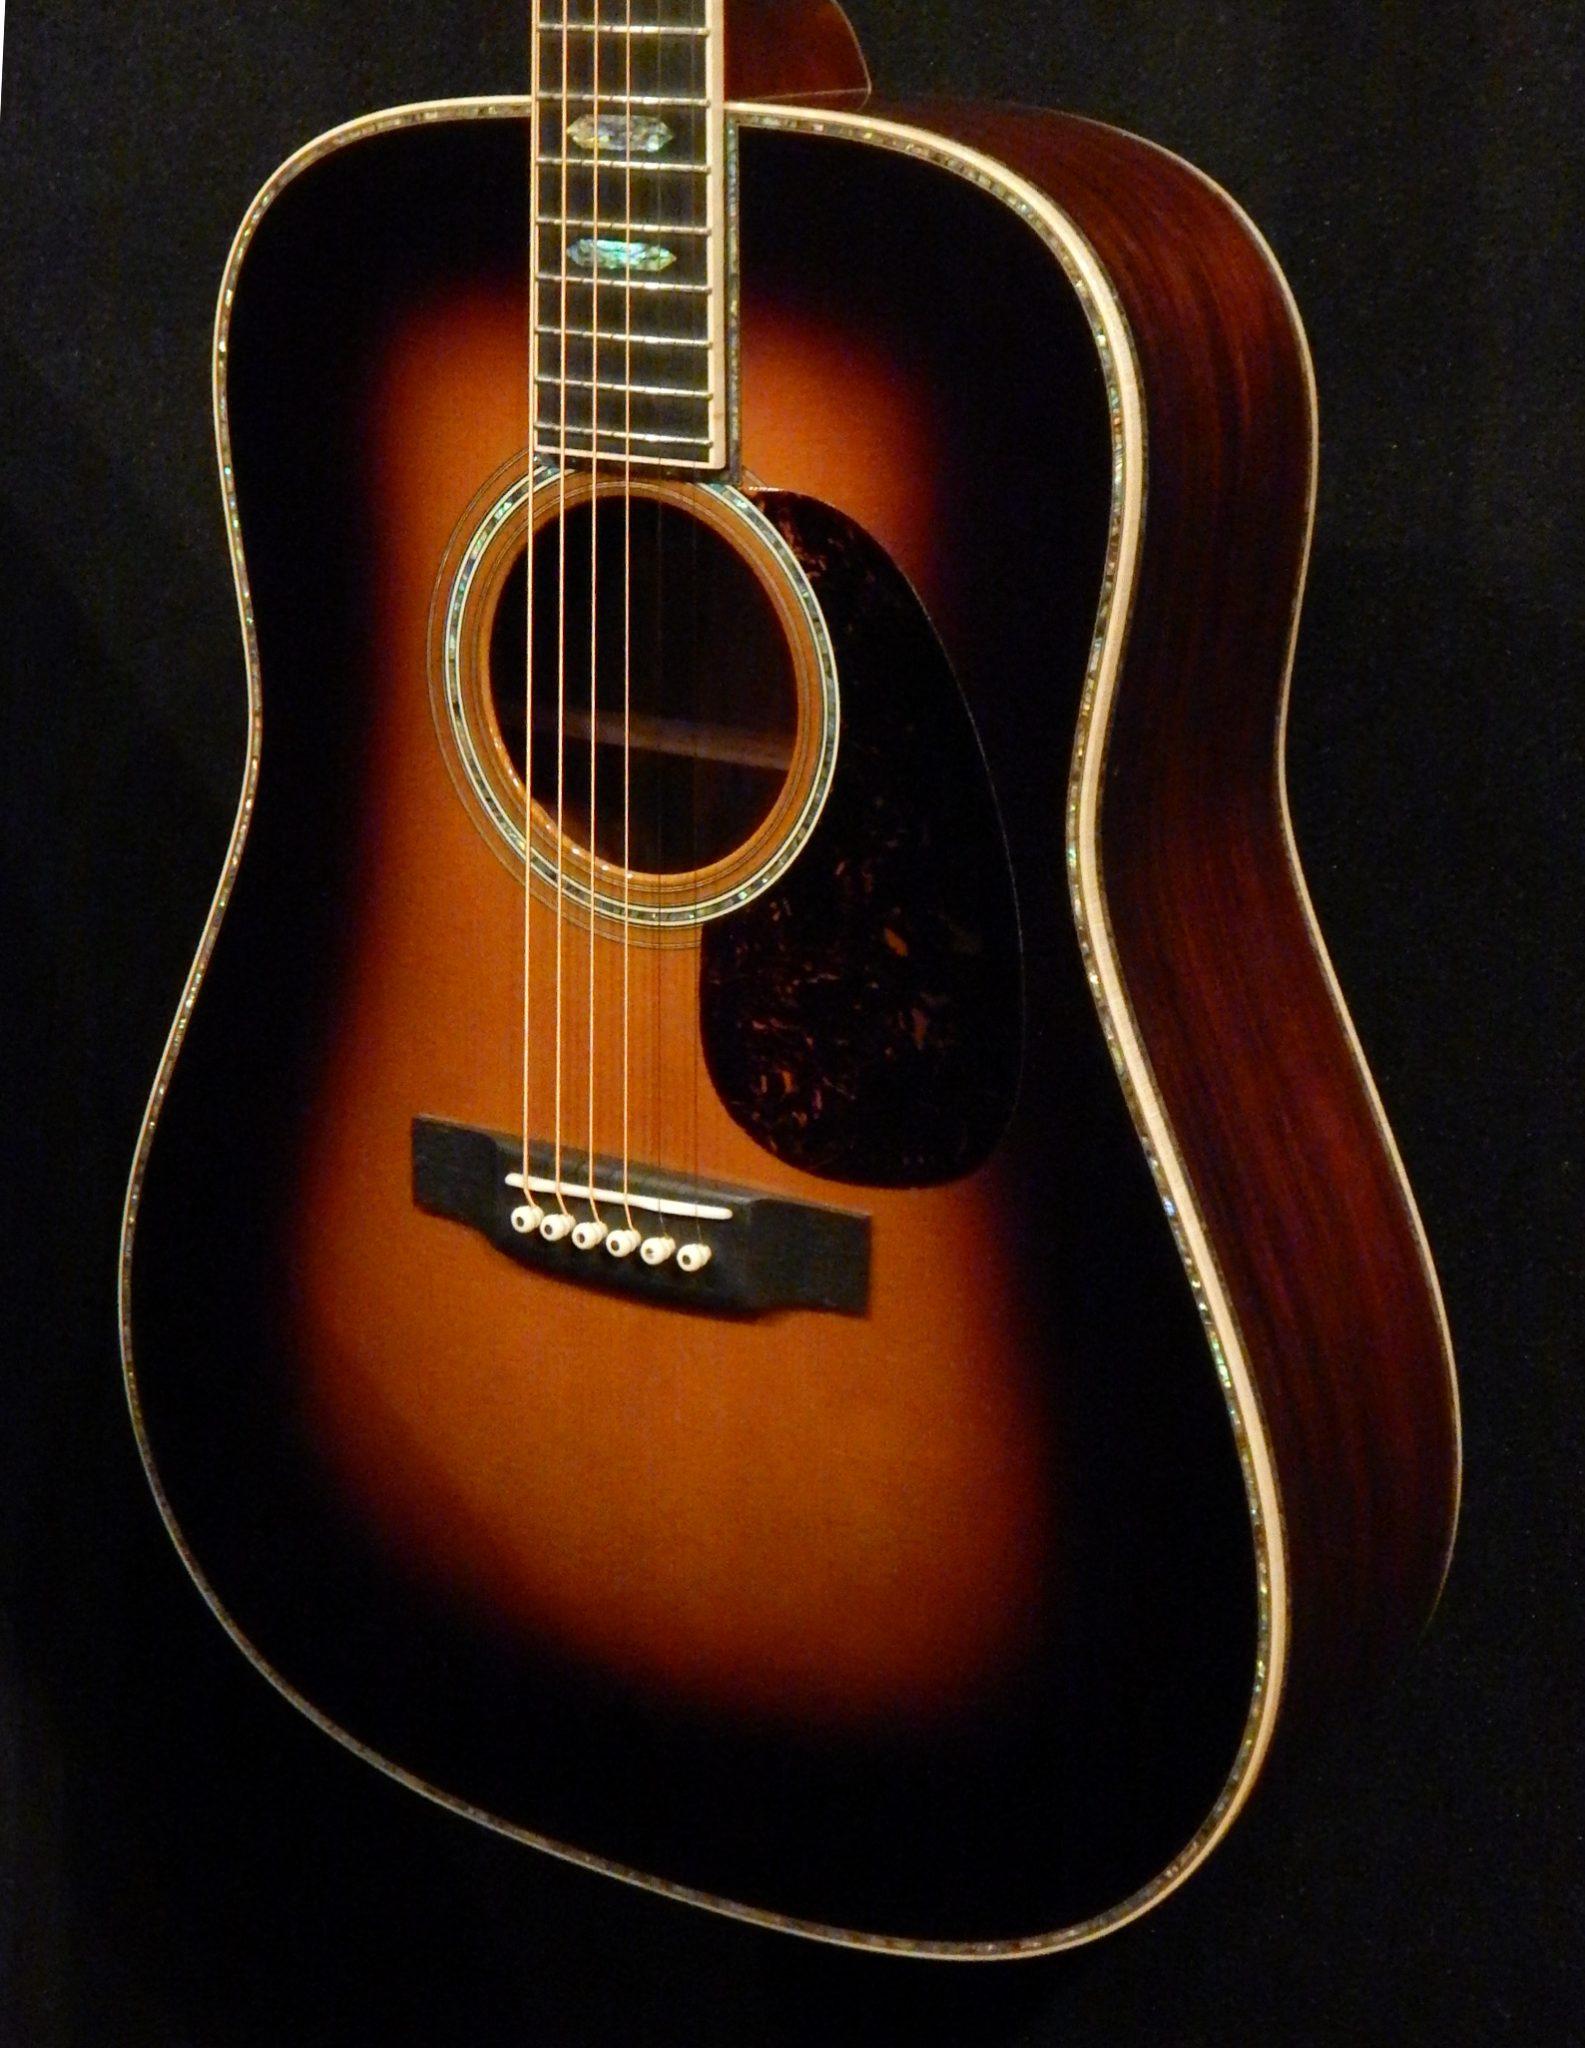 martin d 45 custom guatemalan rosewood and adirondack sunburst down home guitars. Black Bedroom Furniture Sets. Home Design Ideas